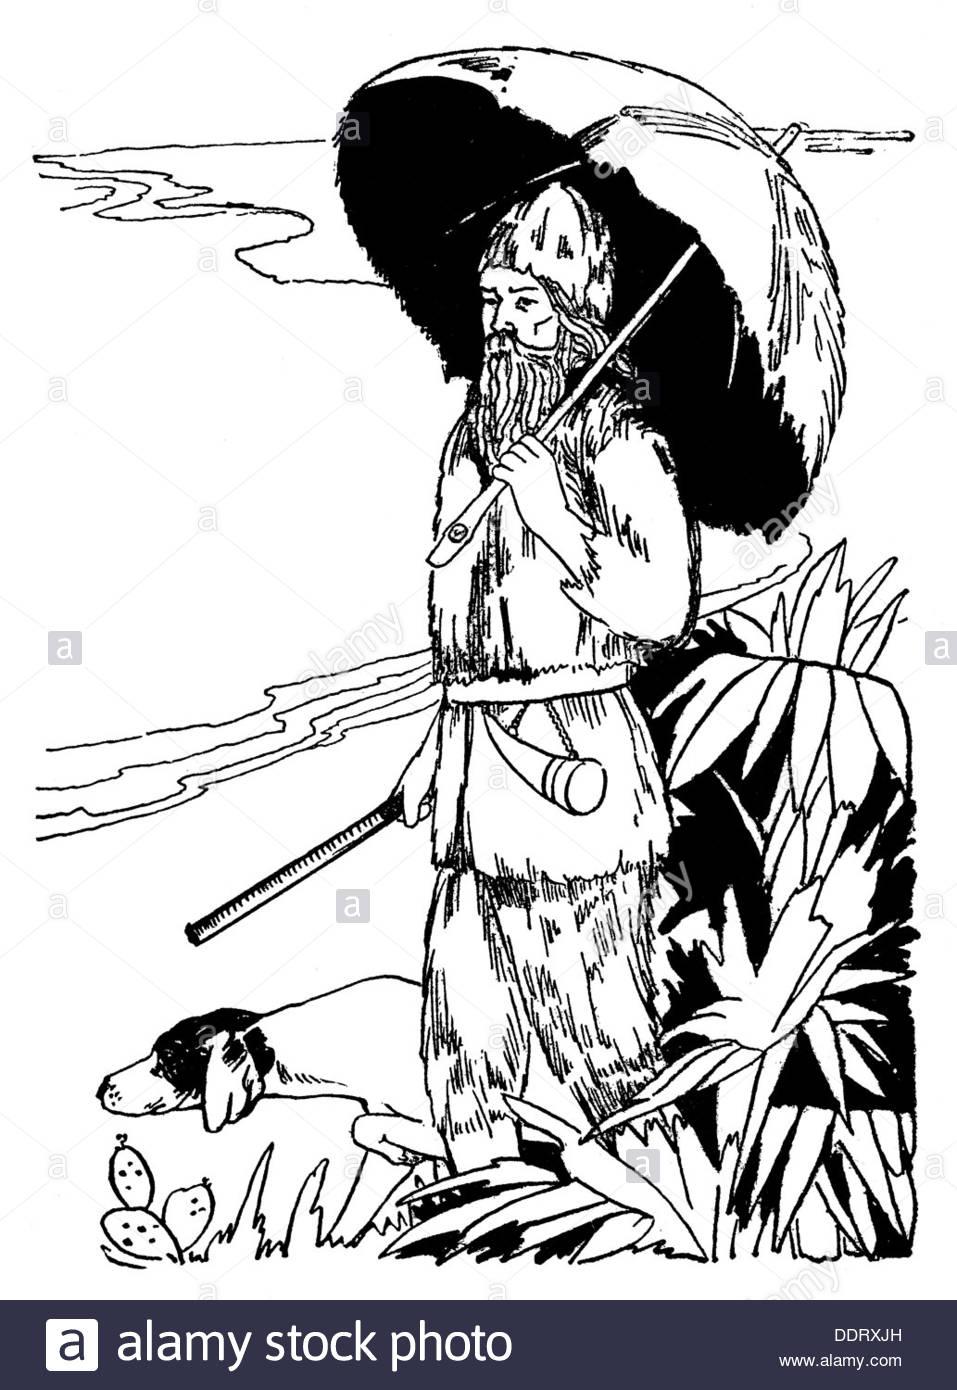 957x1390 Literature Robinson Crusoe By Daniel Defoe (1660